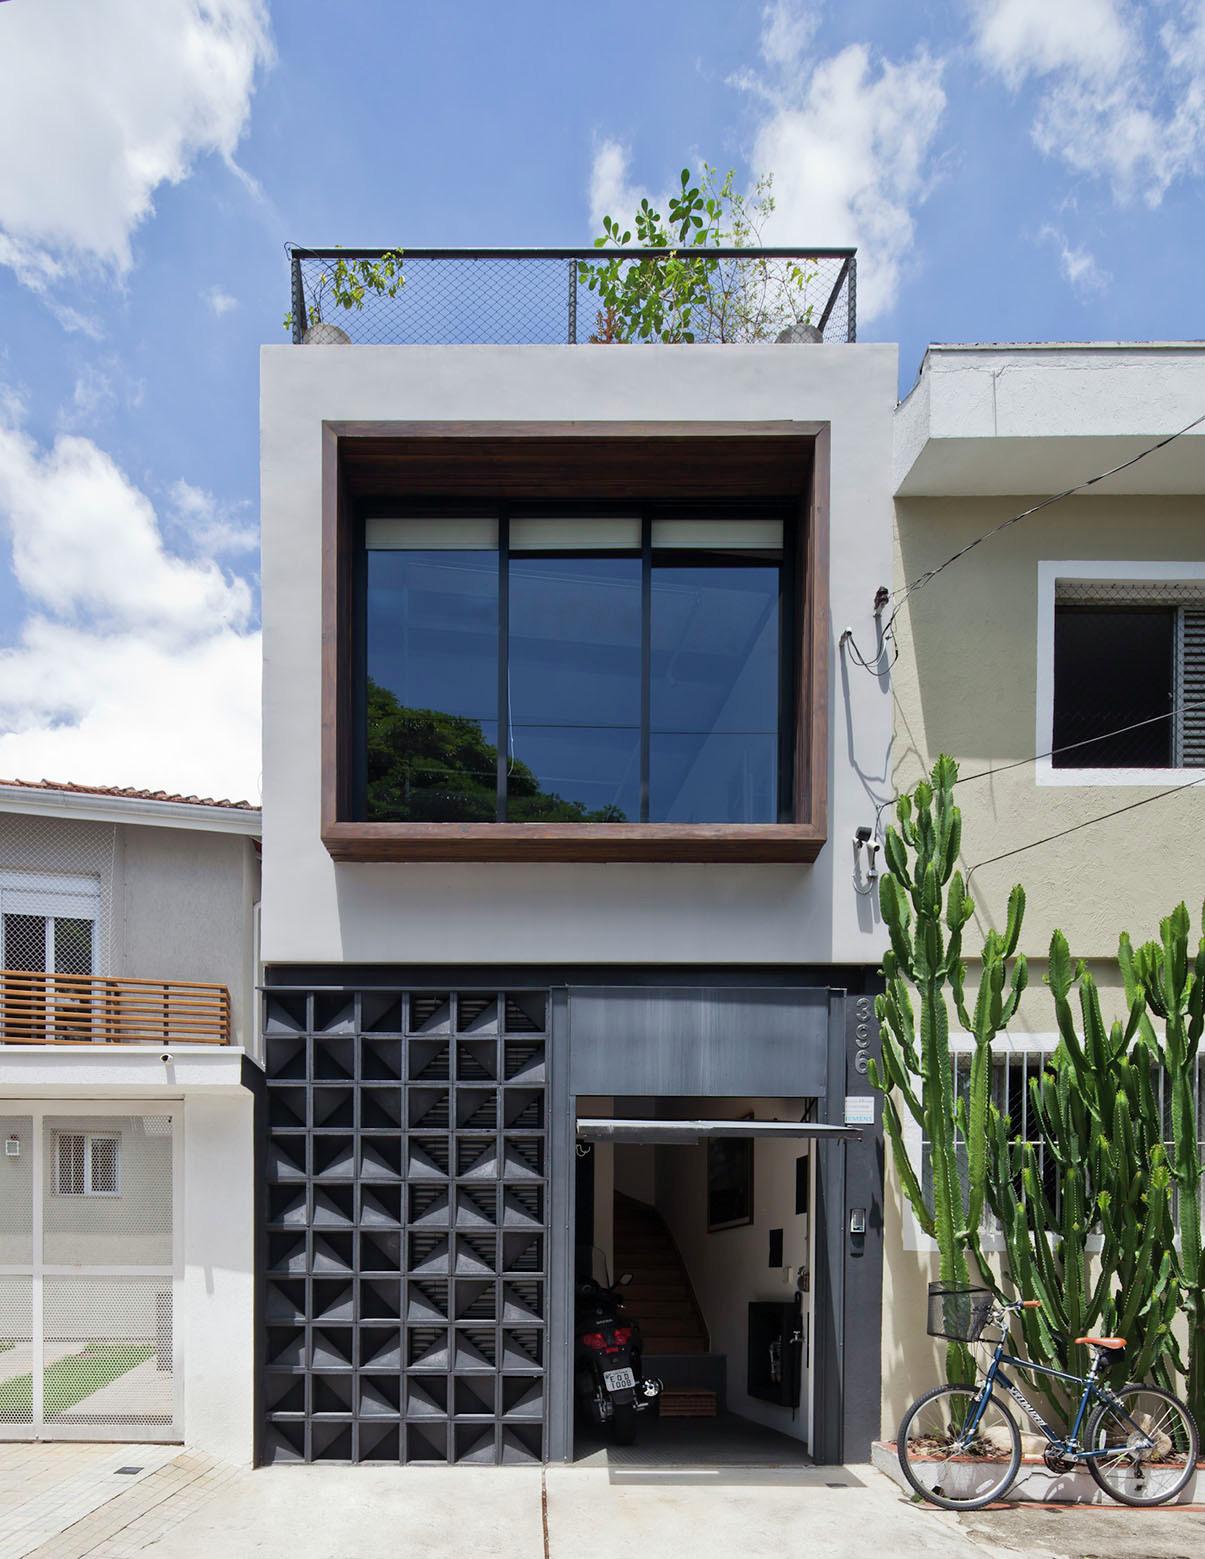 Casa ca superlim o studio archdaily brasil - Construye hogar ...